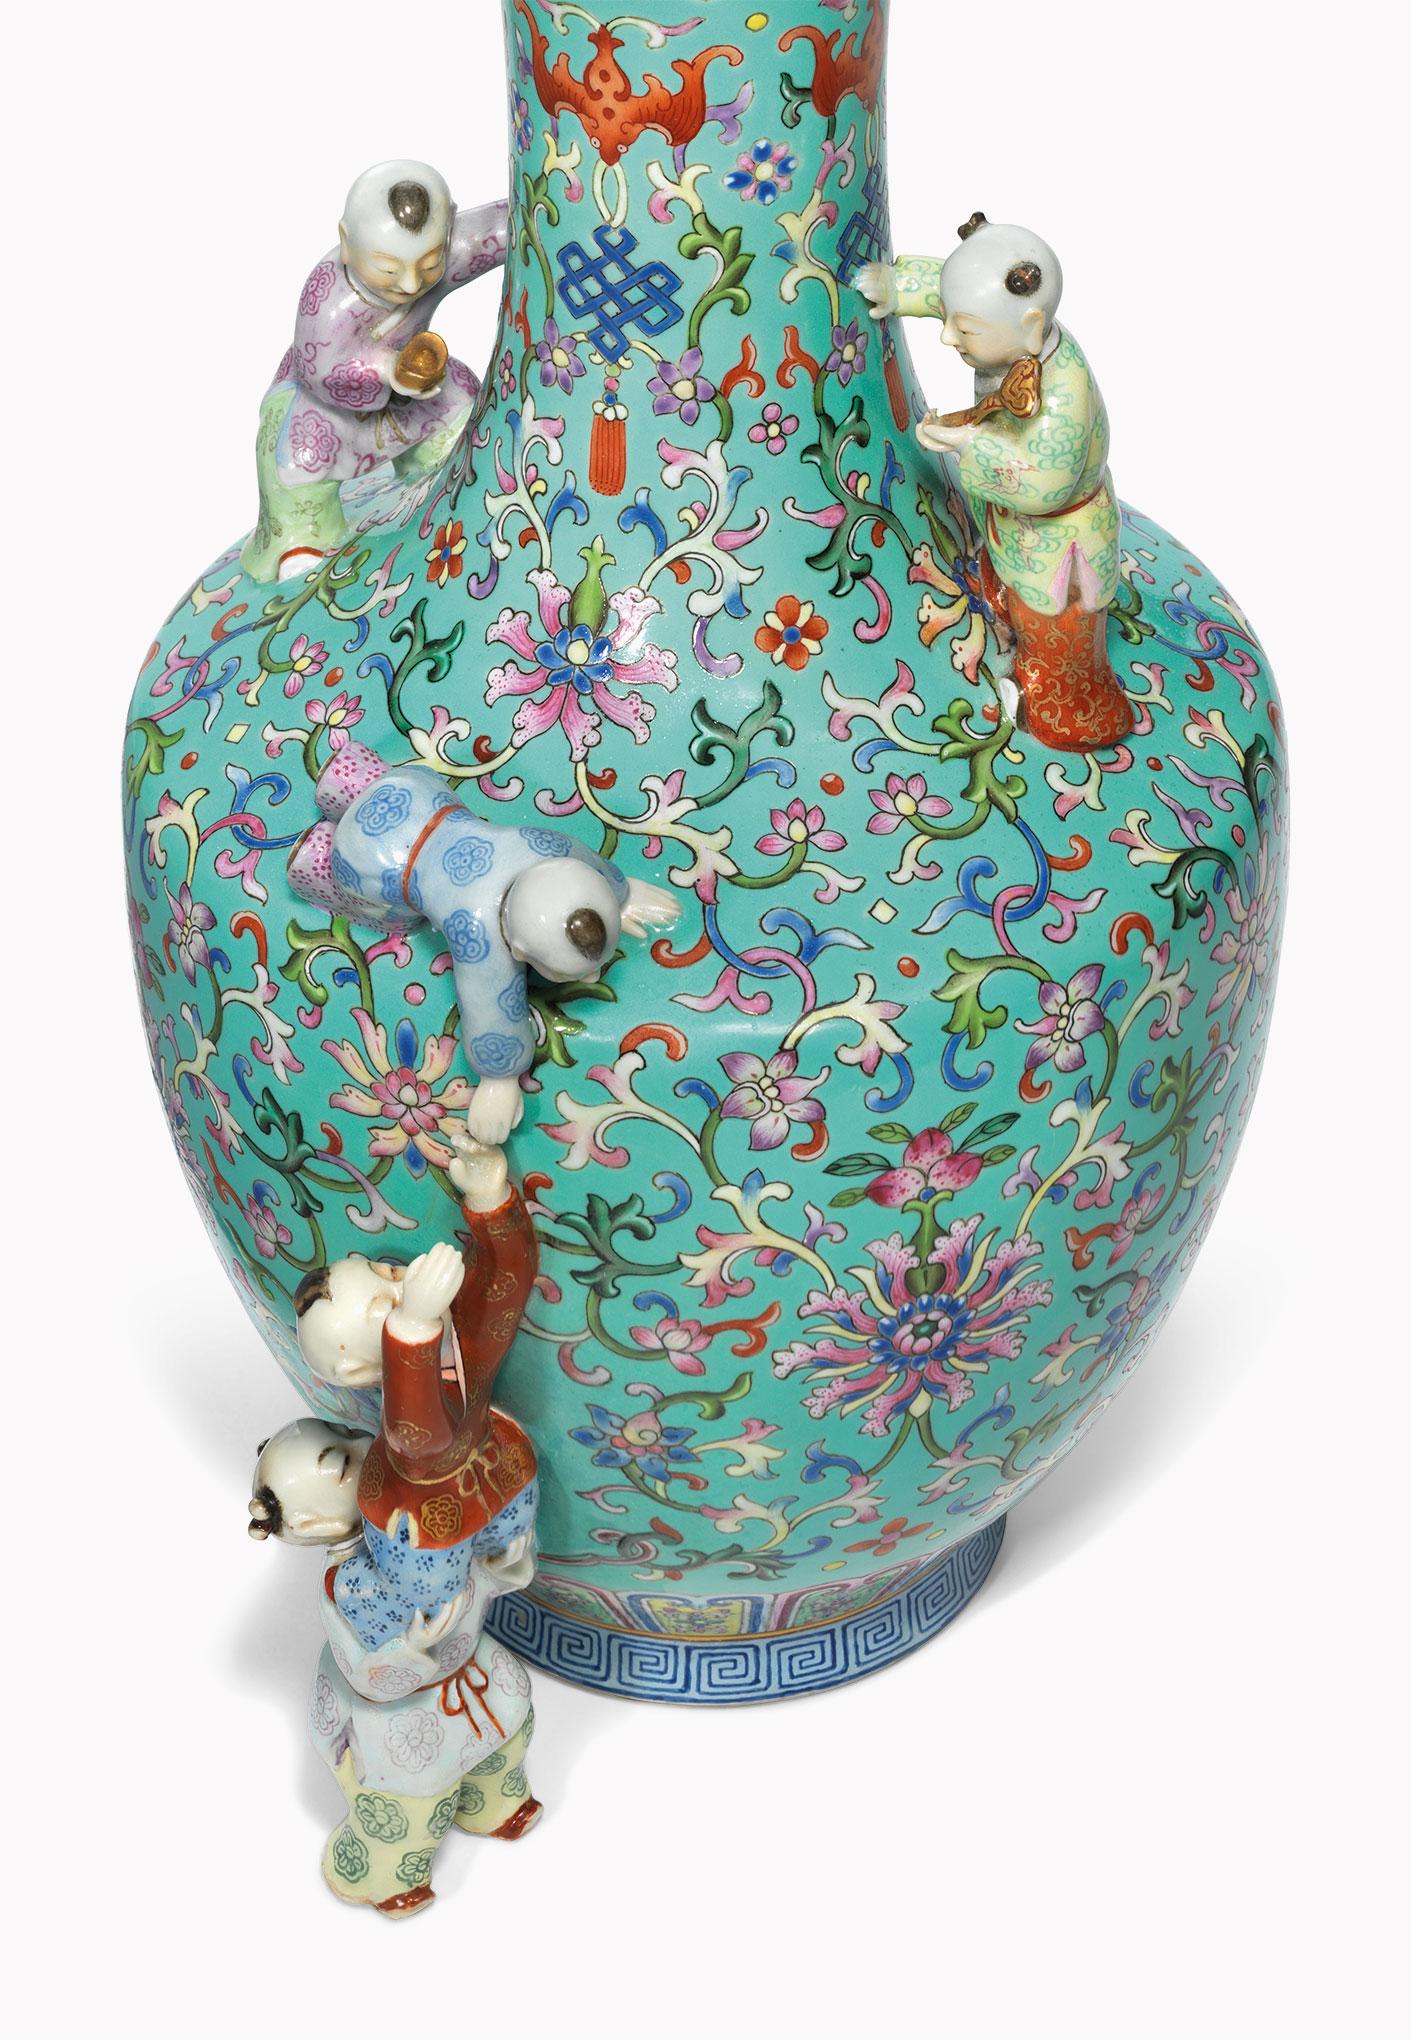 Asian porcelain figurine symbols were